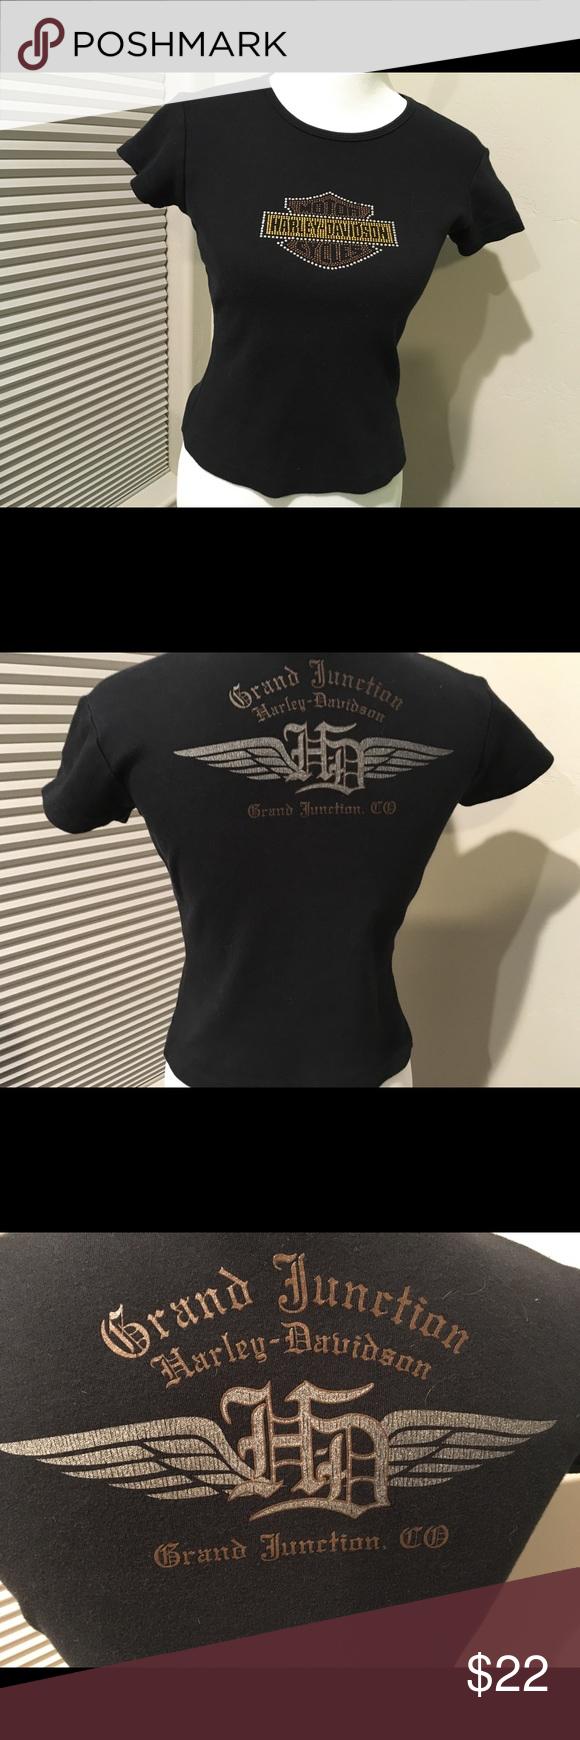 Black harley davidson tshirt, real jailbait sexting nudes